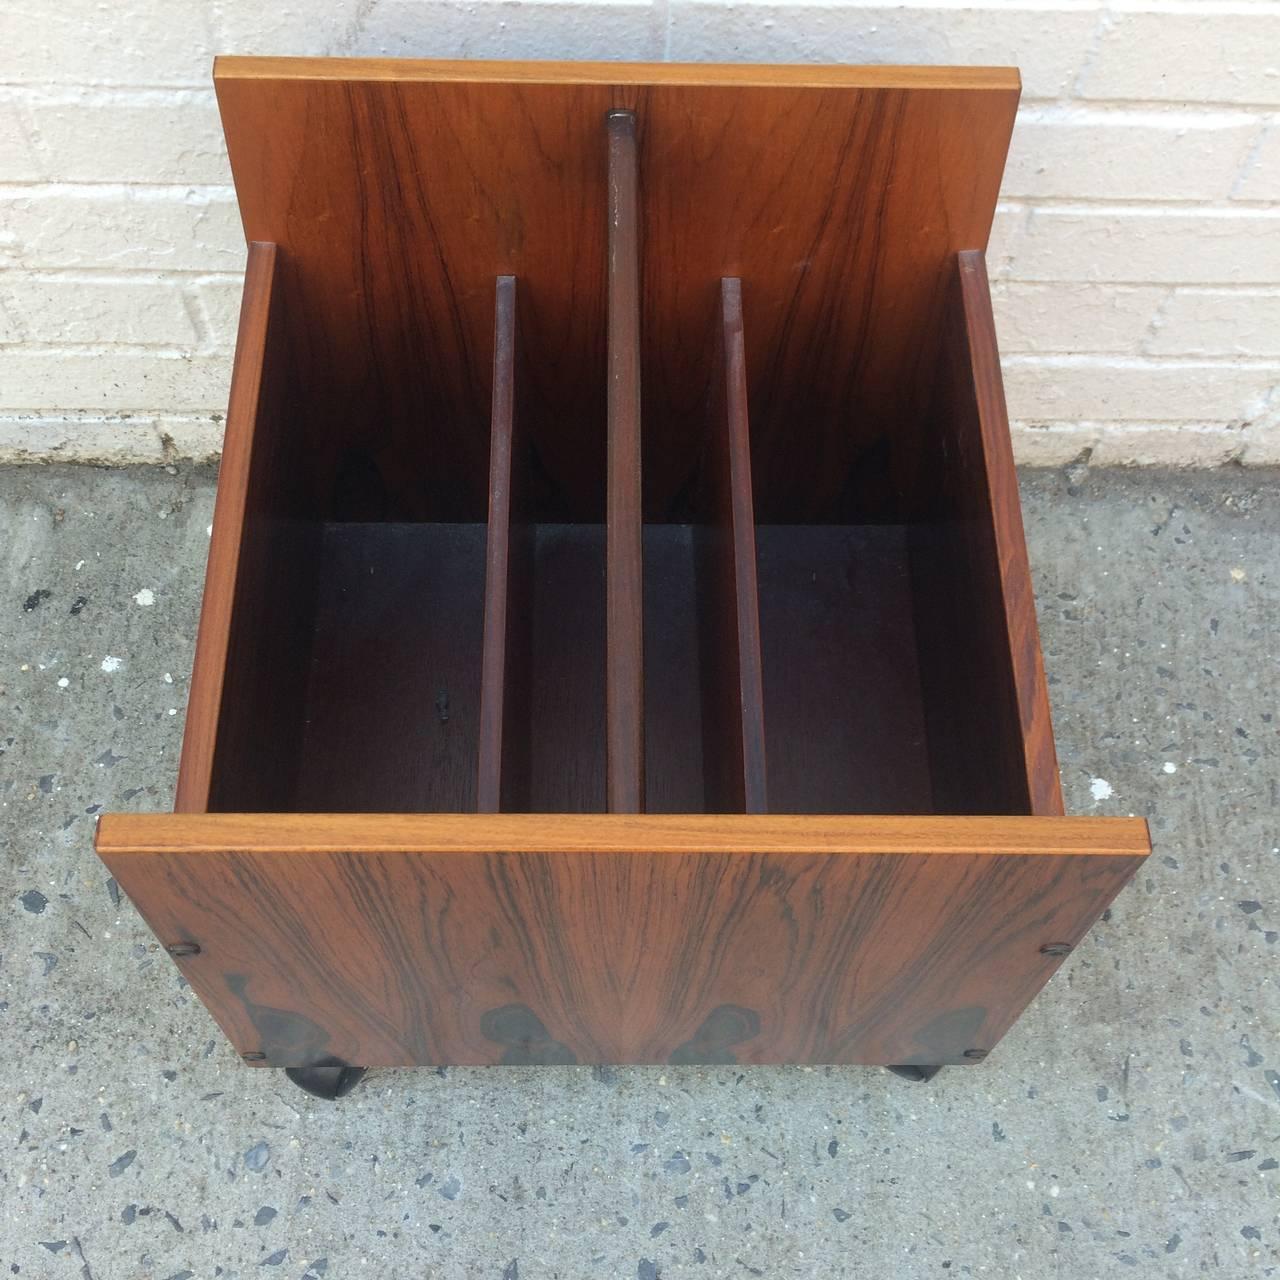 near mint bruksbo rosewood magazine cart for sale at 1stdibs. Black Bedroom Furniture Sets. Home Design Ideas